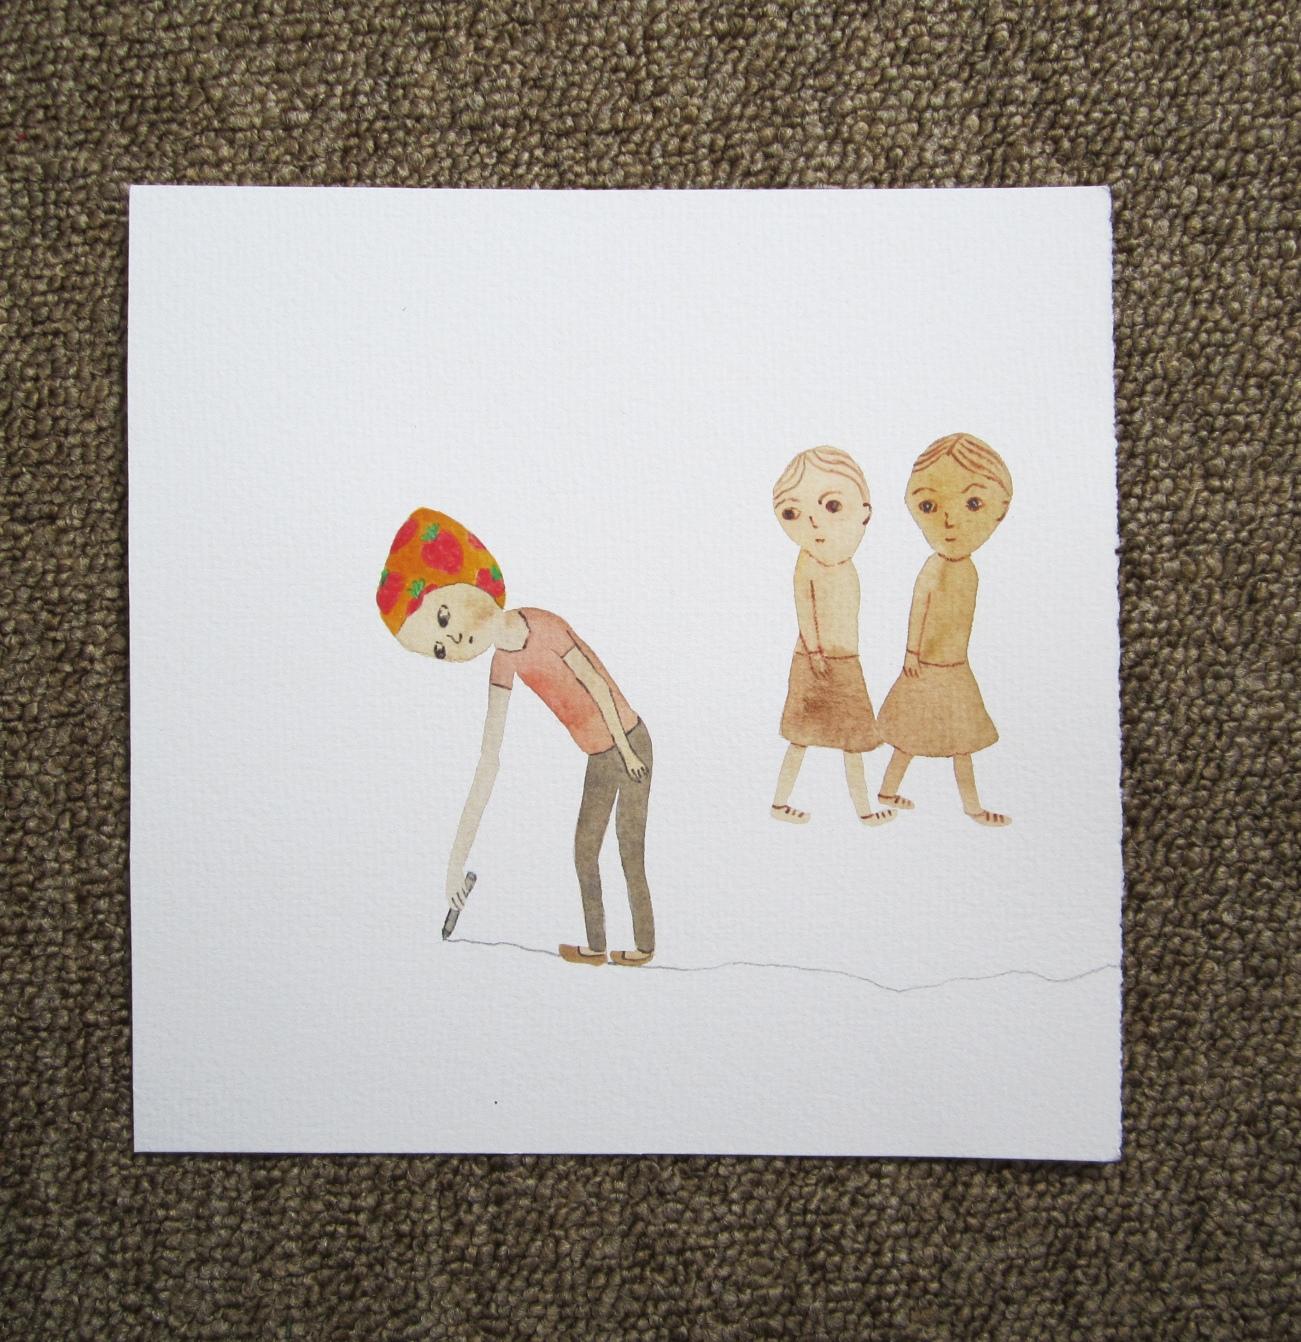 Watewrcolor, 20*20cm, 2012